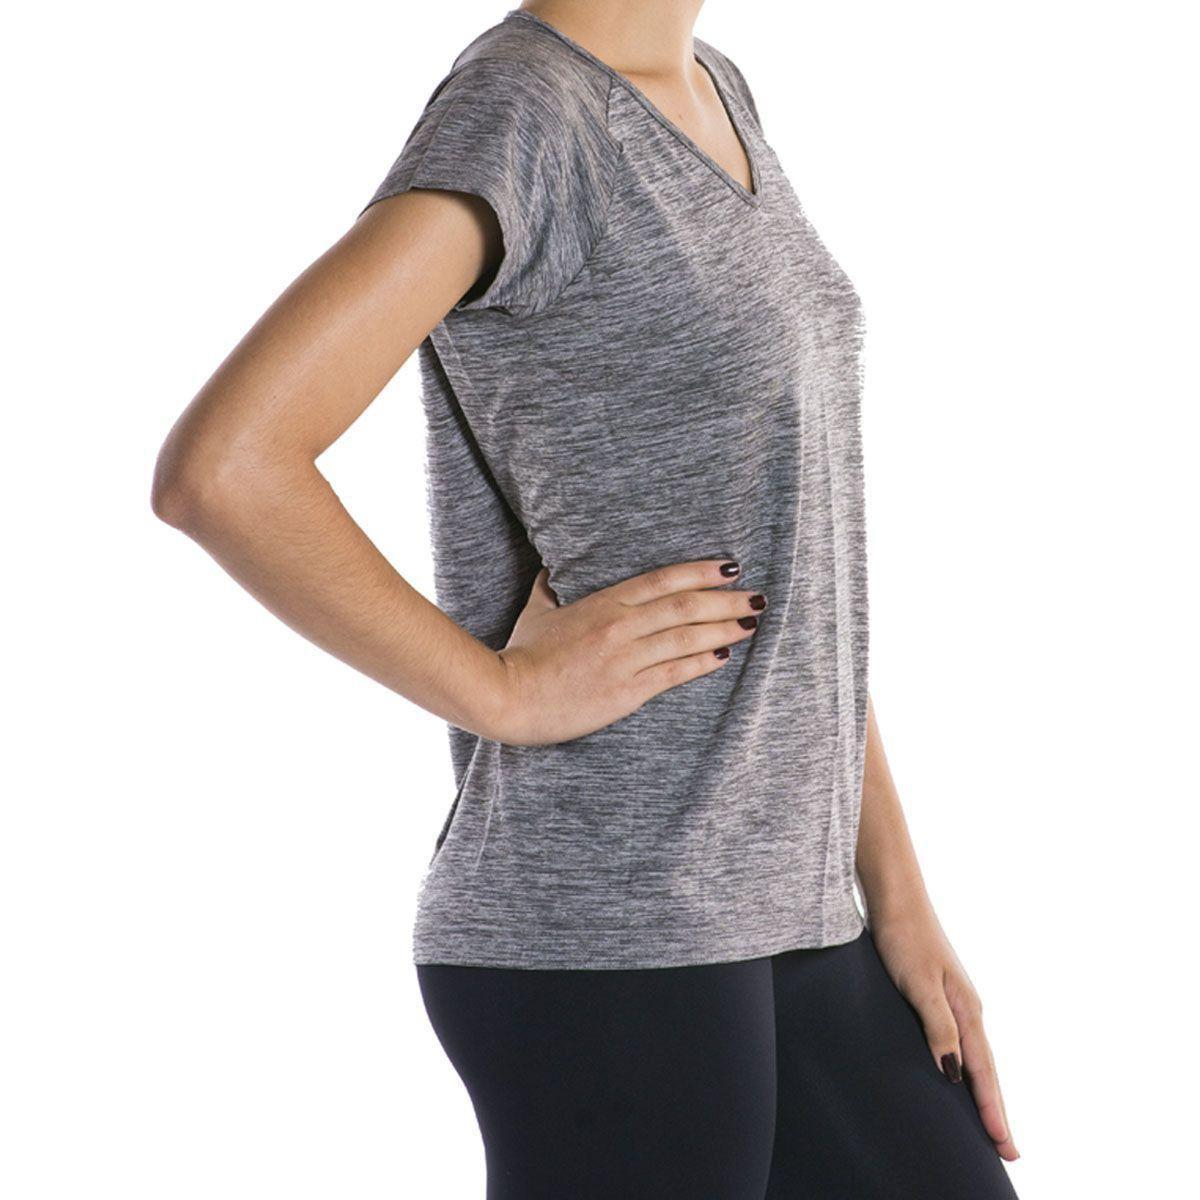 cc33b3cc36bd Camiseta Feminina Lupo Sport Comfortable Mescla Ref. 71660-001